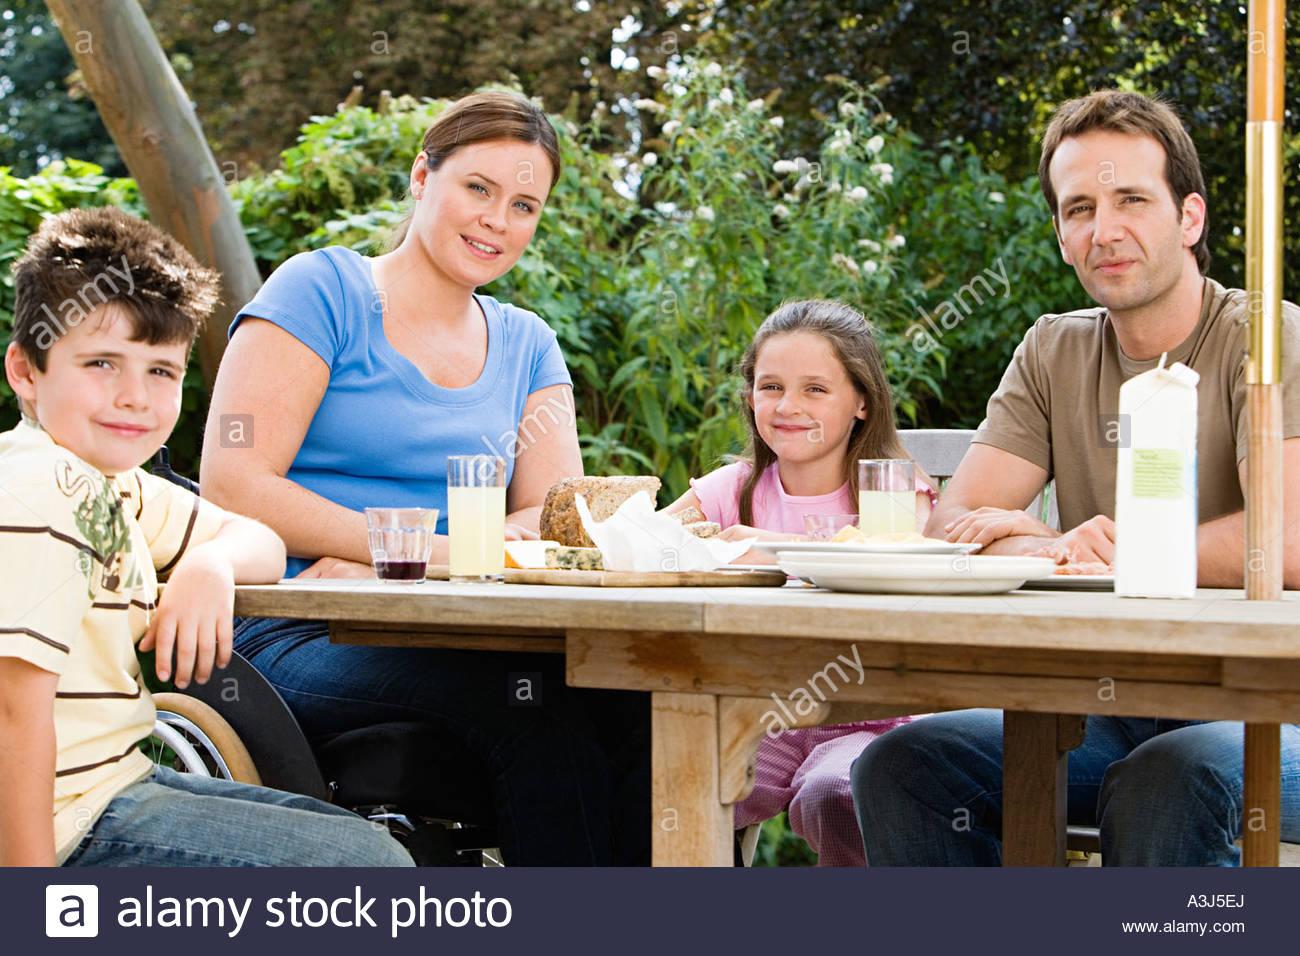 Familiy dining al fresco - Stock Image